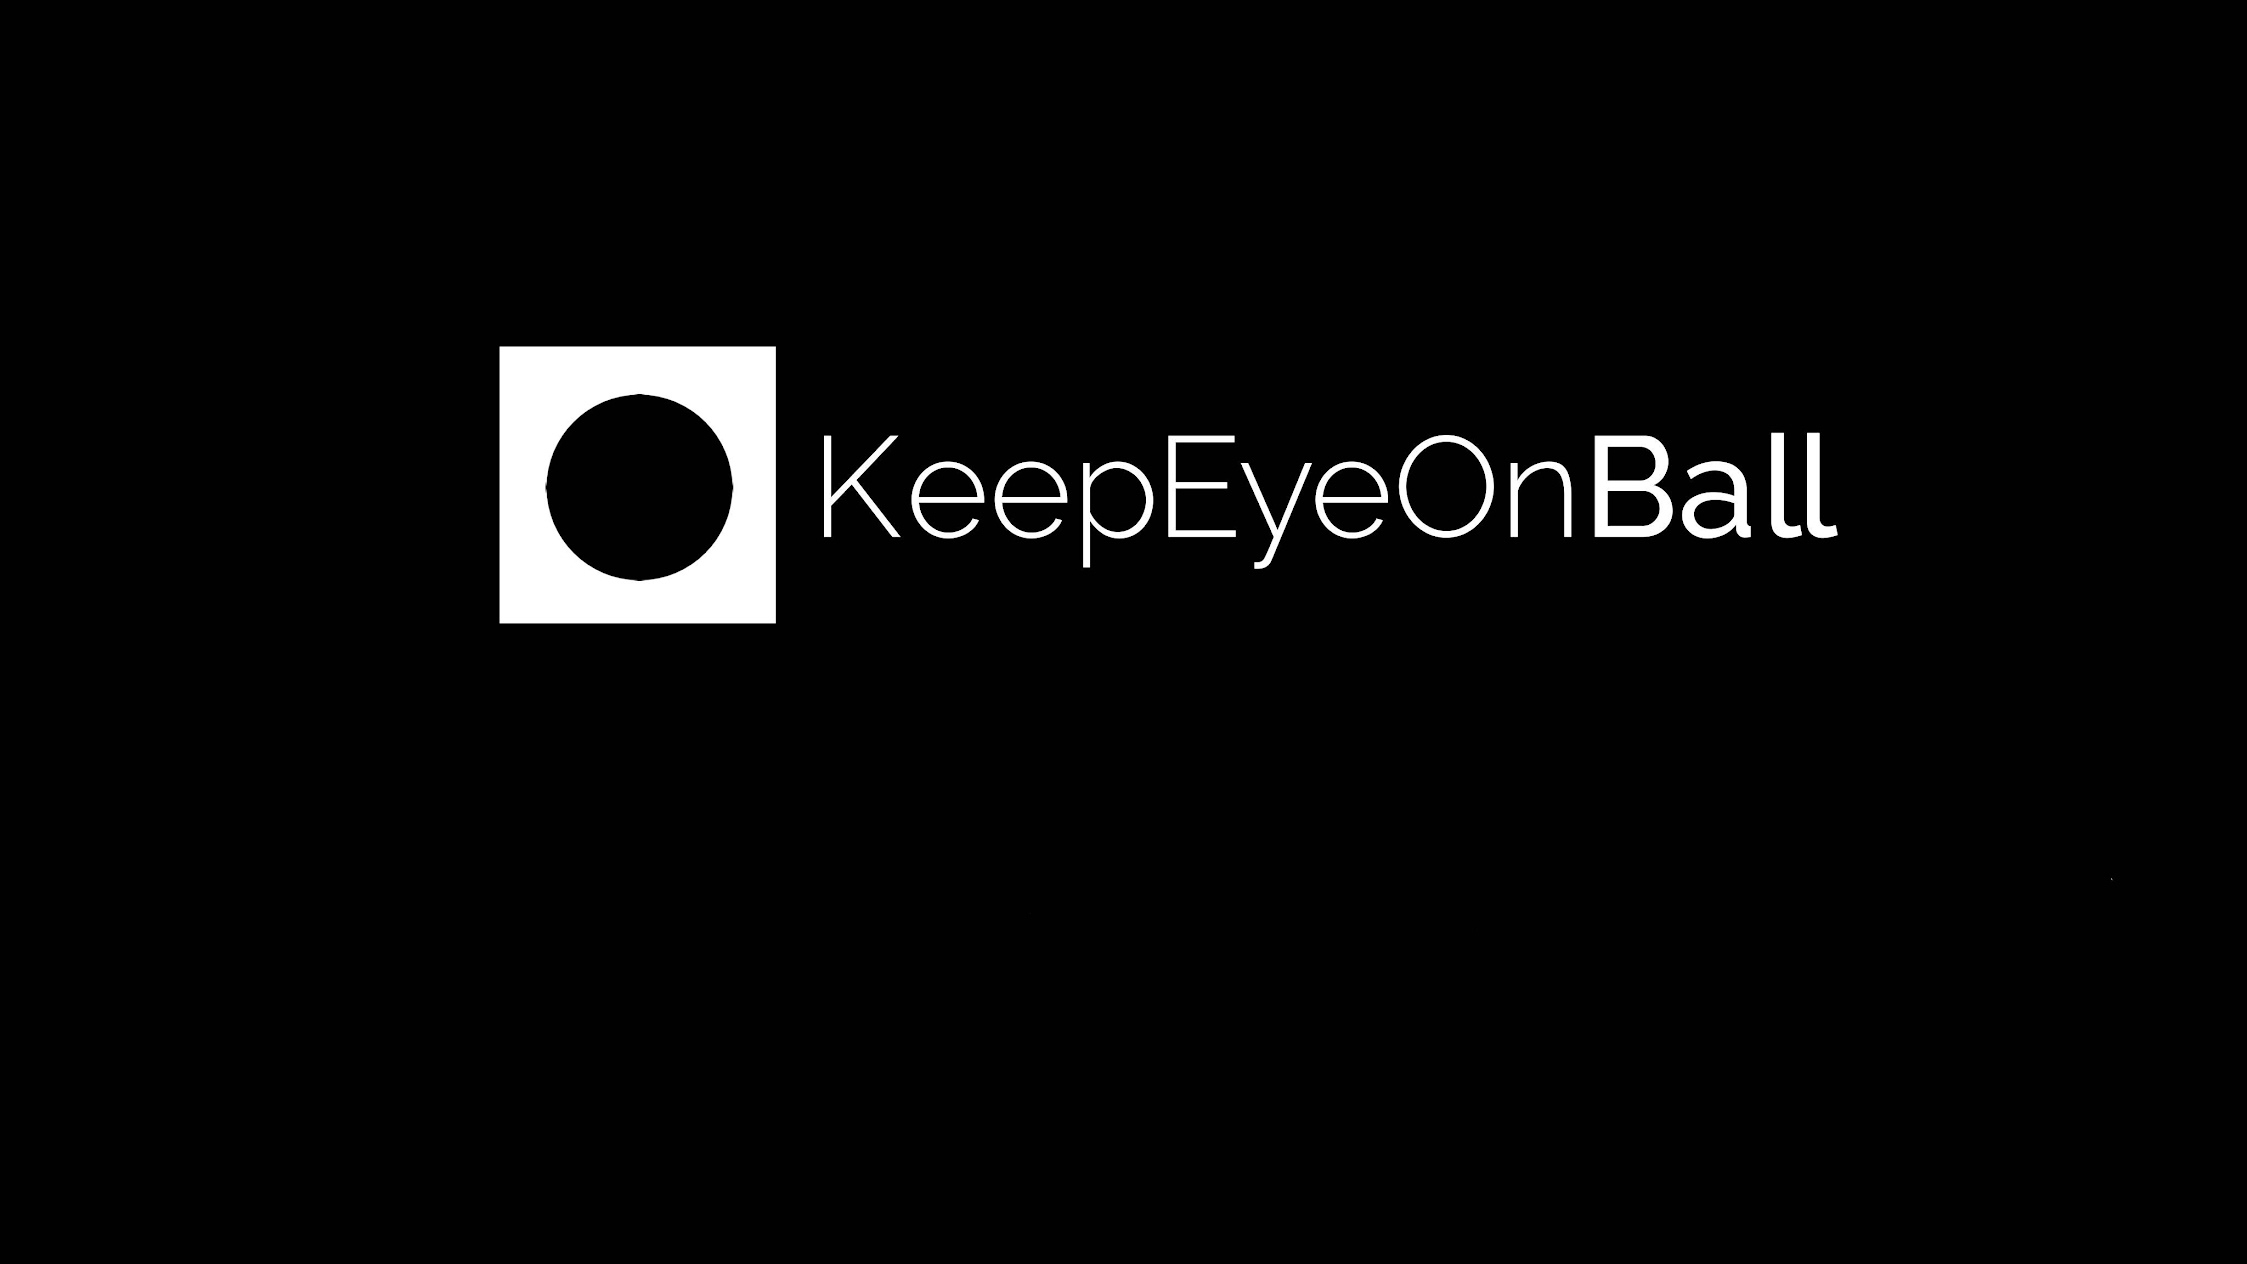 KeepEyeOnBall GmbH